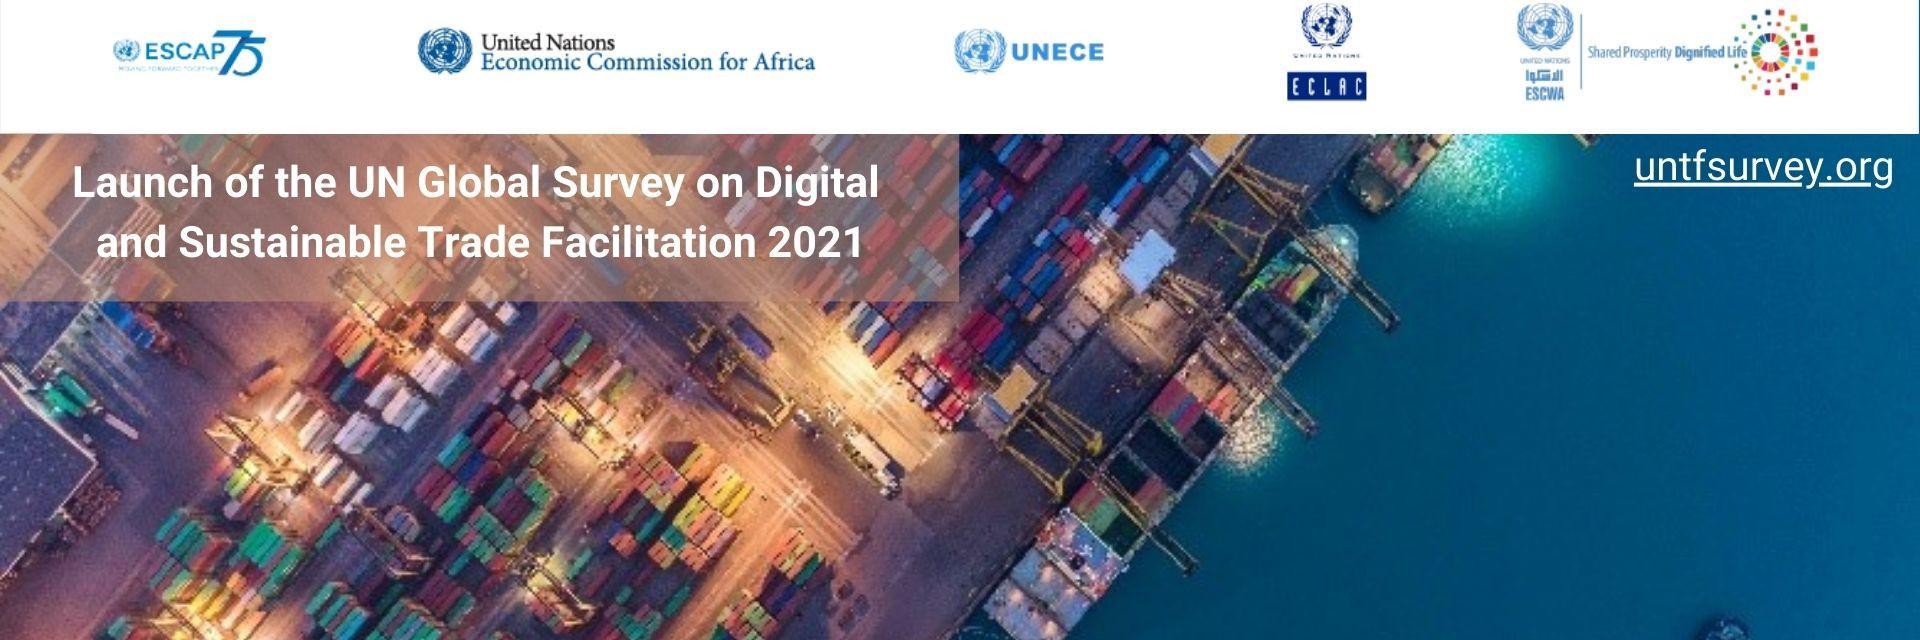 Progress in streamlining trade procedures continues despite COVID-19 crisis, UN survey shows